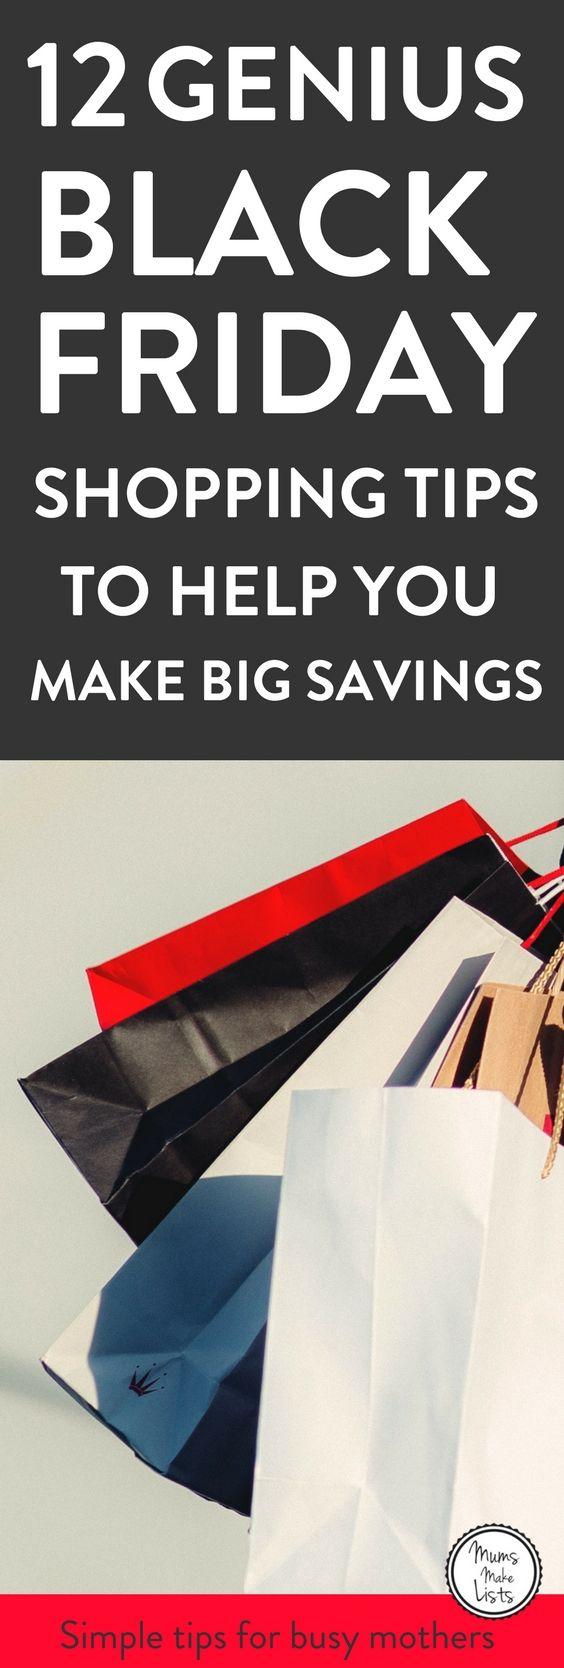 Best 25+ Black friday shopping ideas on Pinterest ...